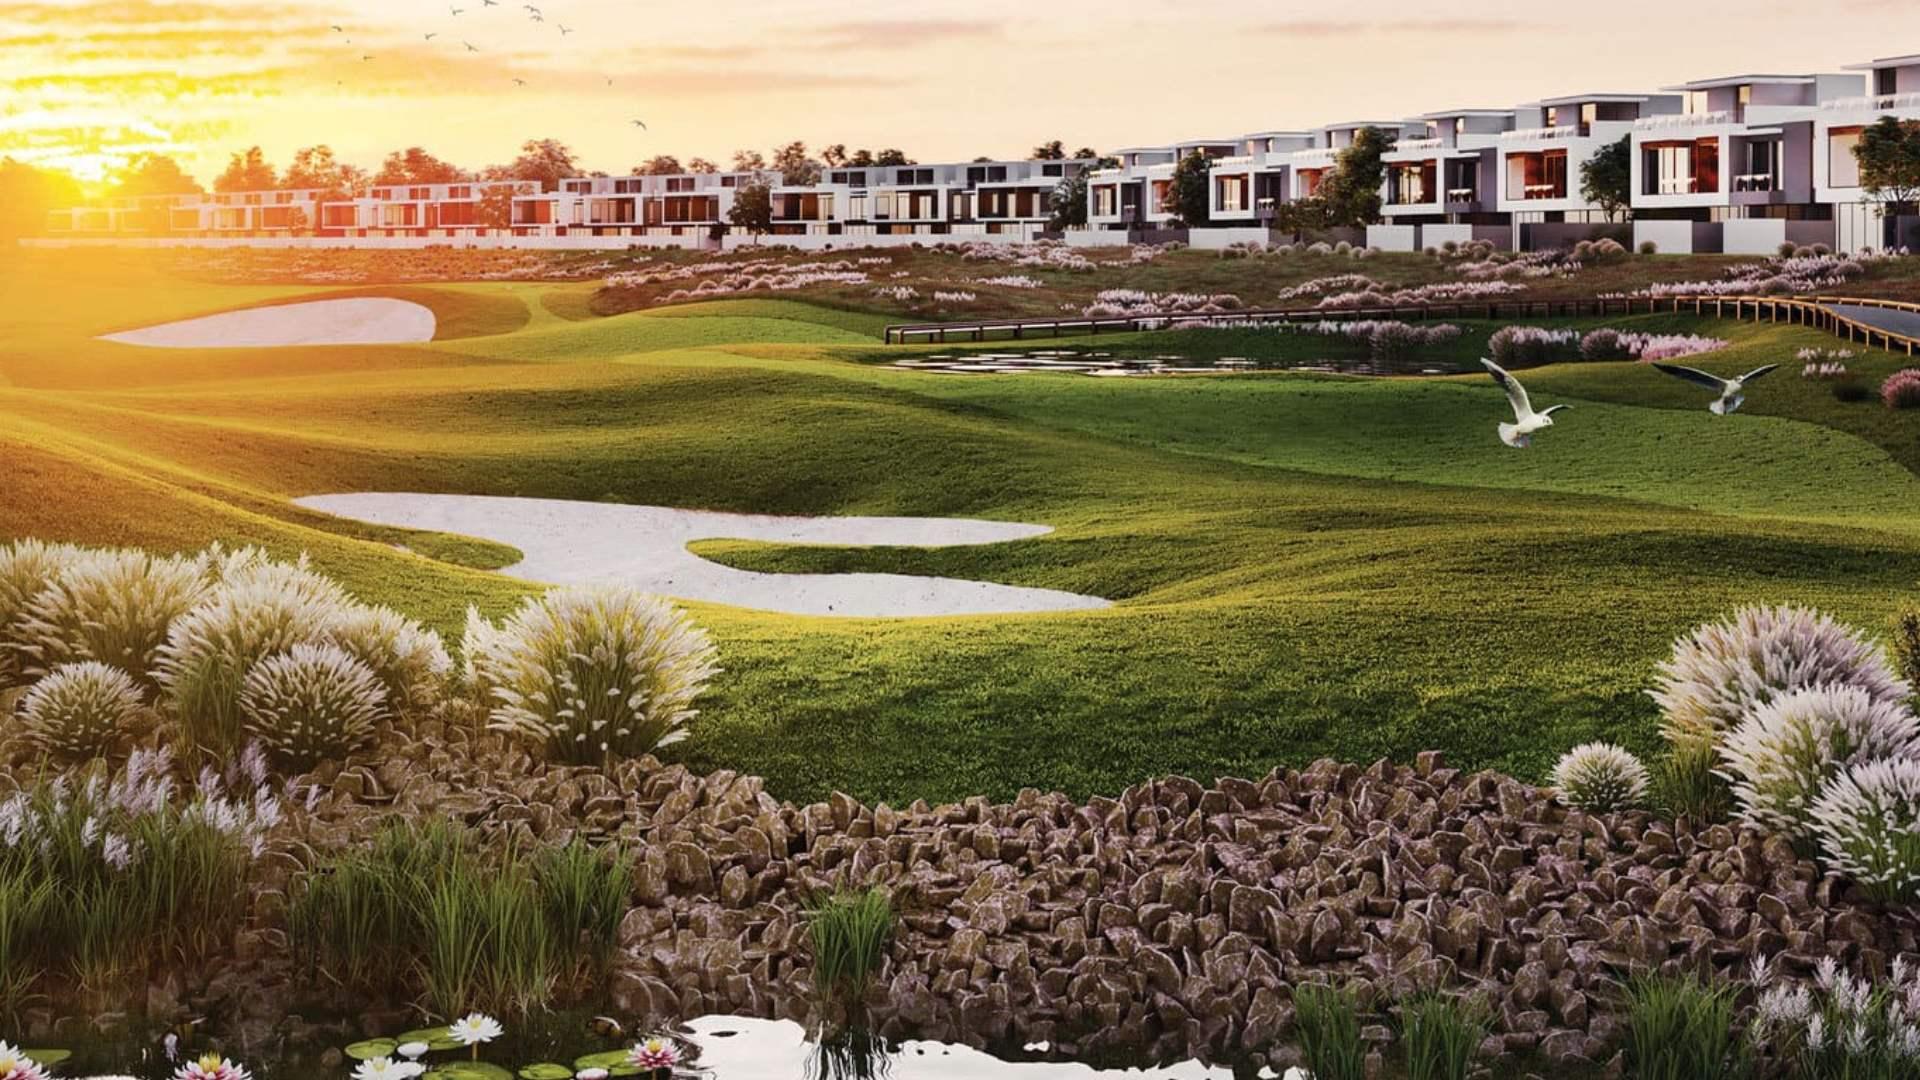 JUMEIRAH LUXURY, Jumeirah Golf Estates, Dubai, UAE – photo 3